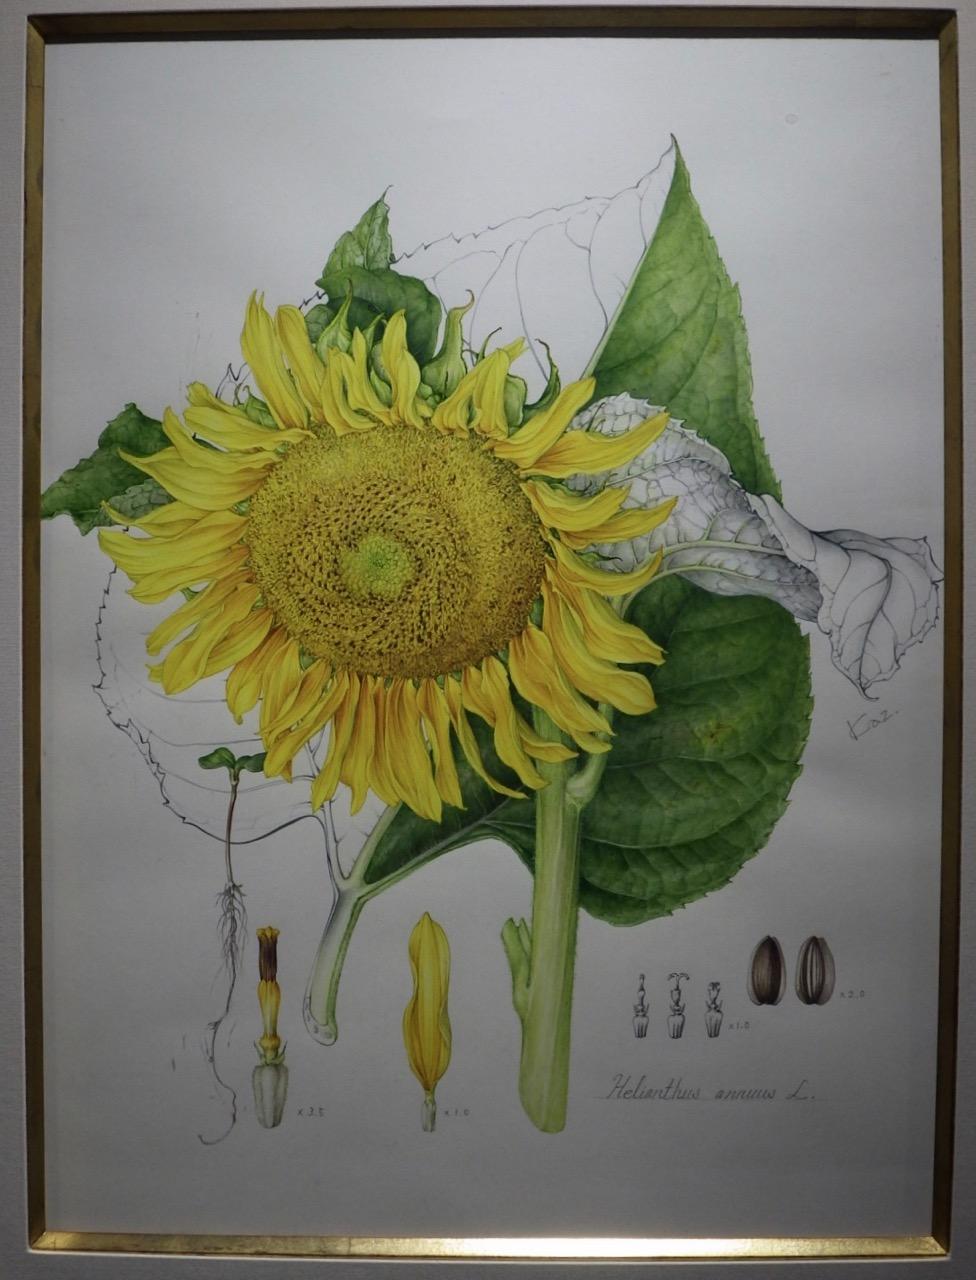 https://www.hitohaku.jp/blog/db4956aef046c0f55437bc128446492ab86560b1.jpg